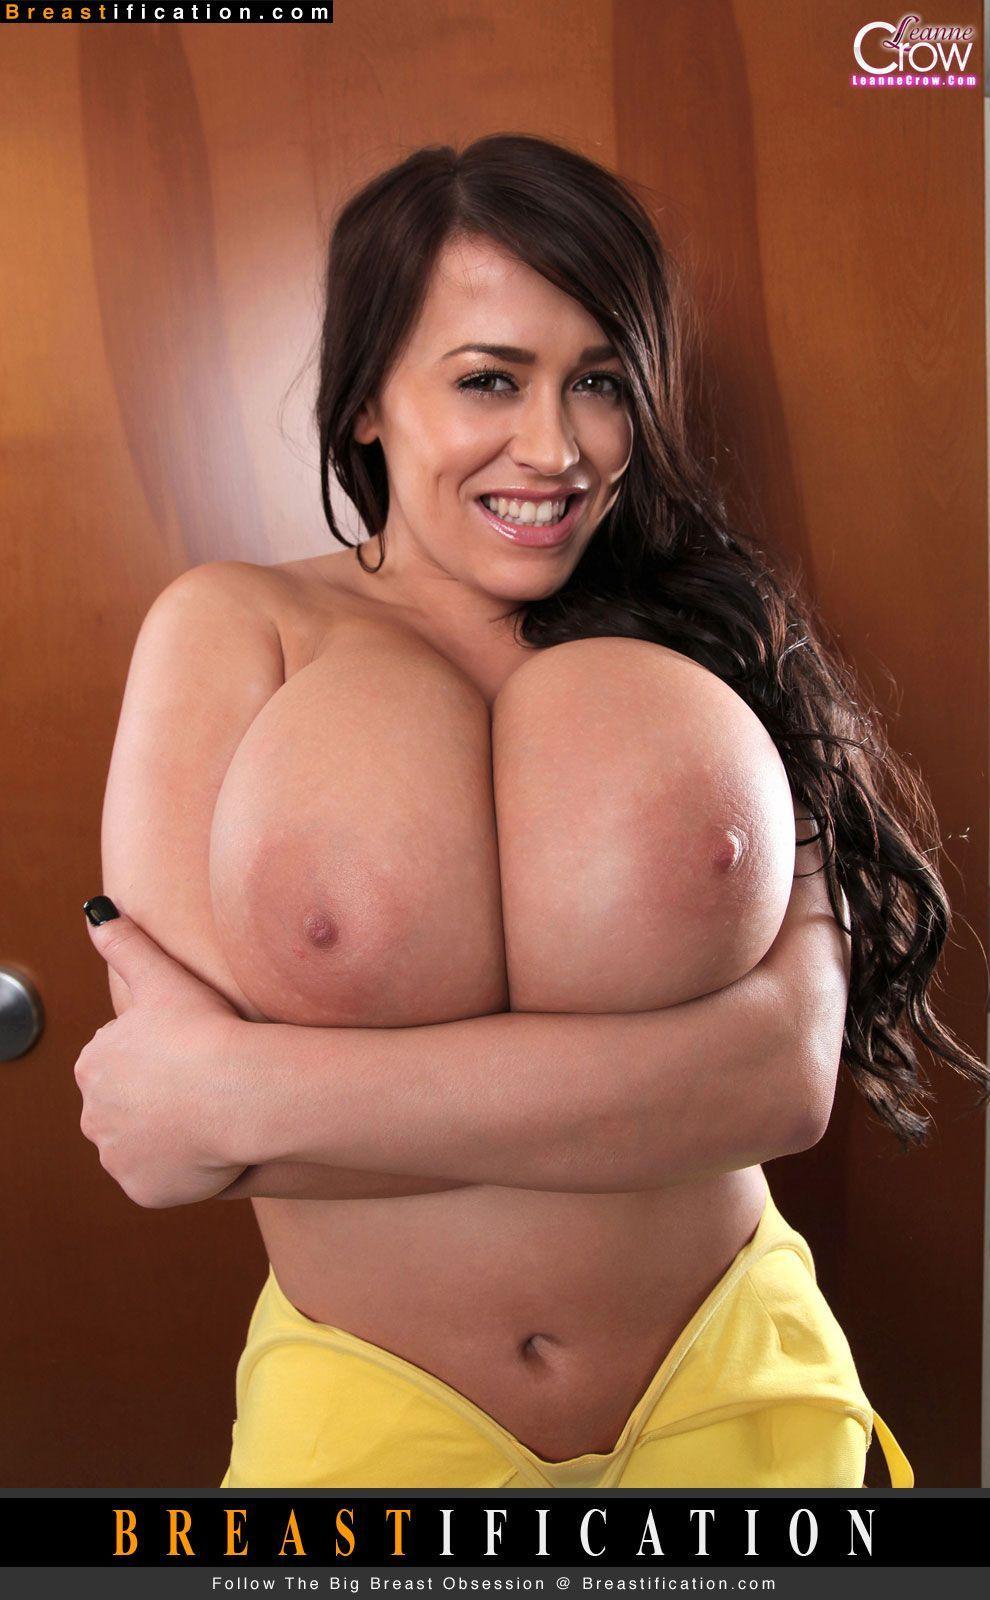 Guy squezze big tits Big Boob Guy Squeezing Tit Sex Photo